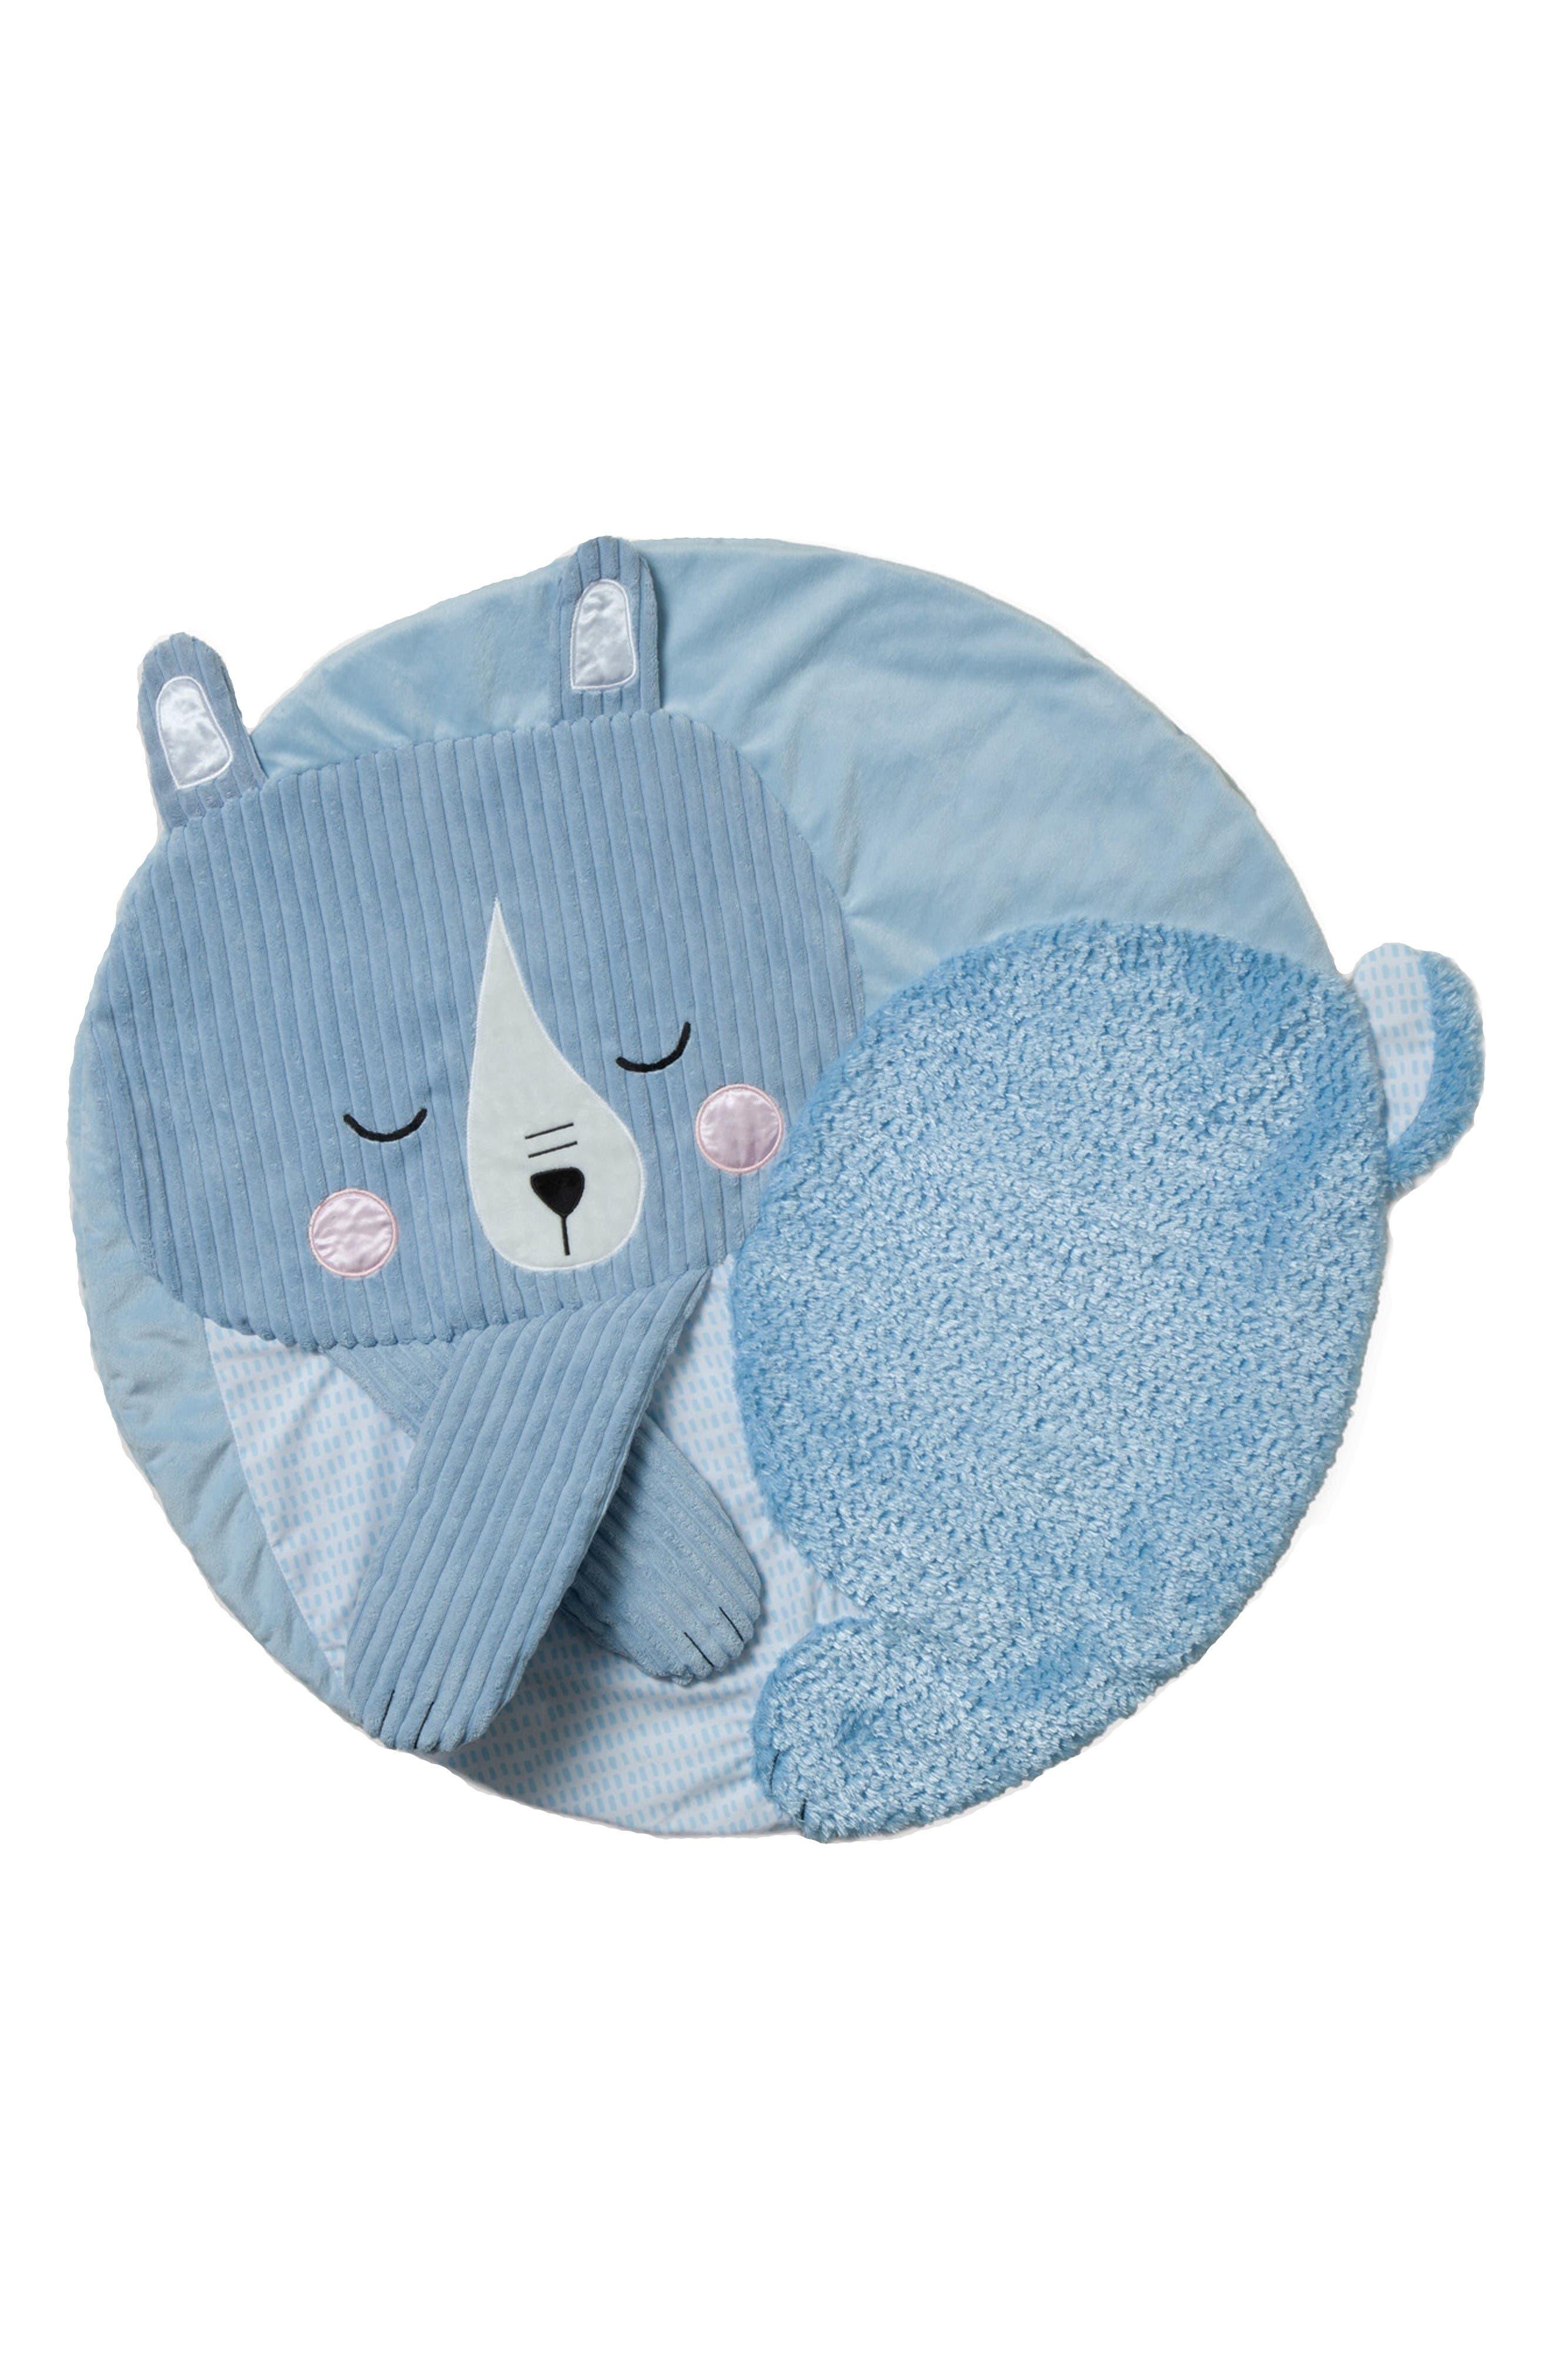 Bear Tactile Playmat,                         Main,                         color, Blue